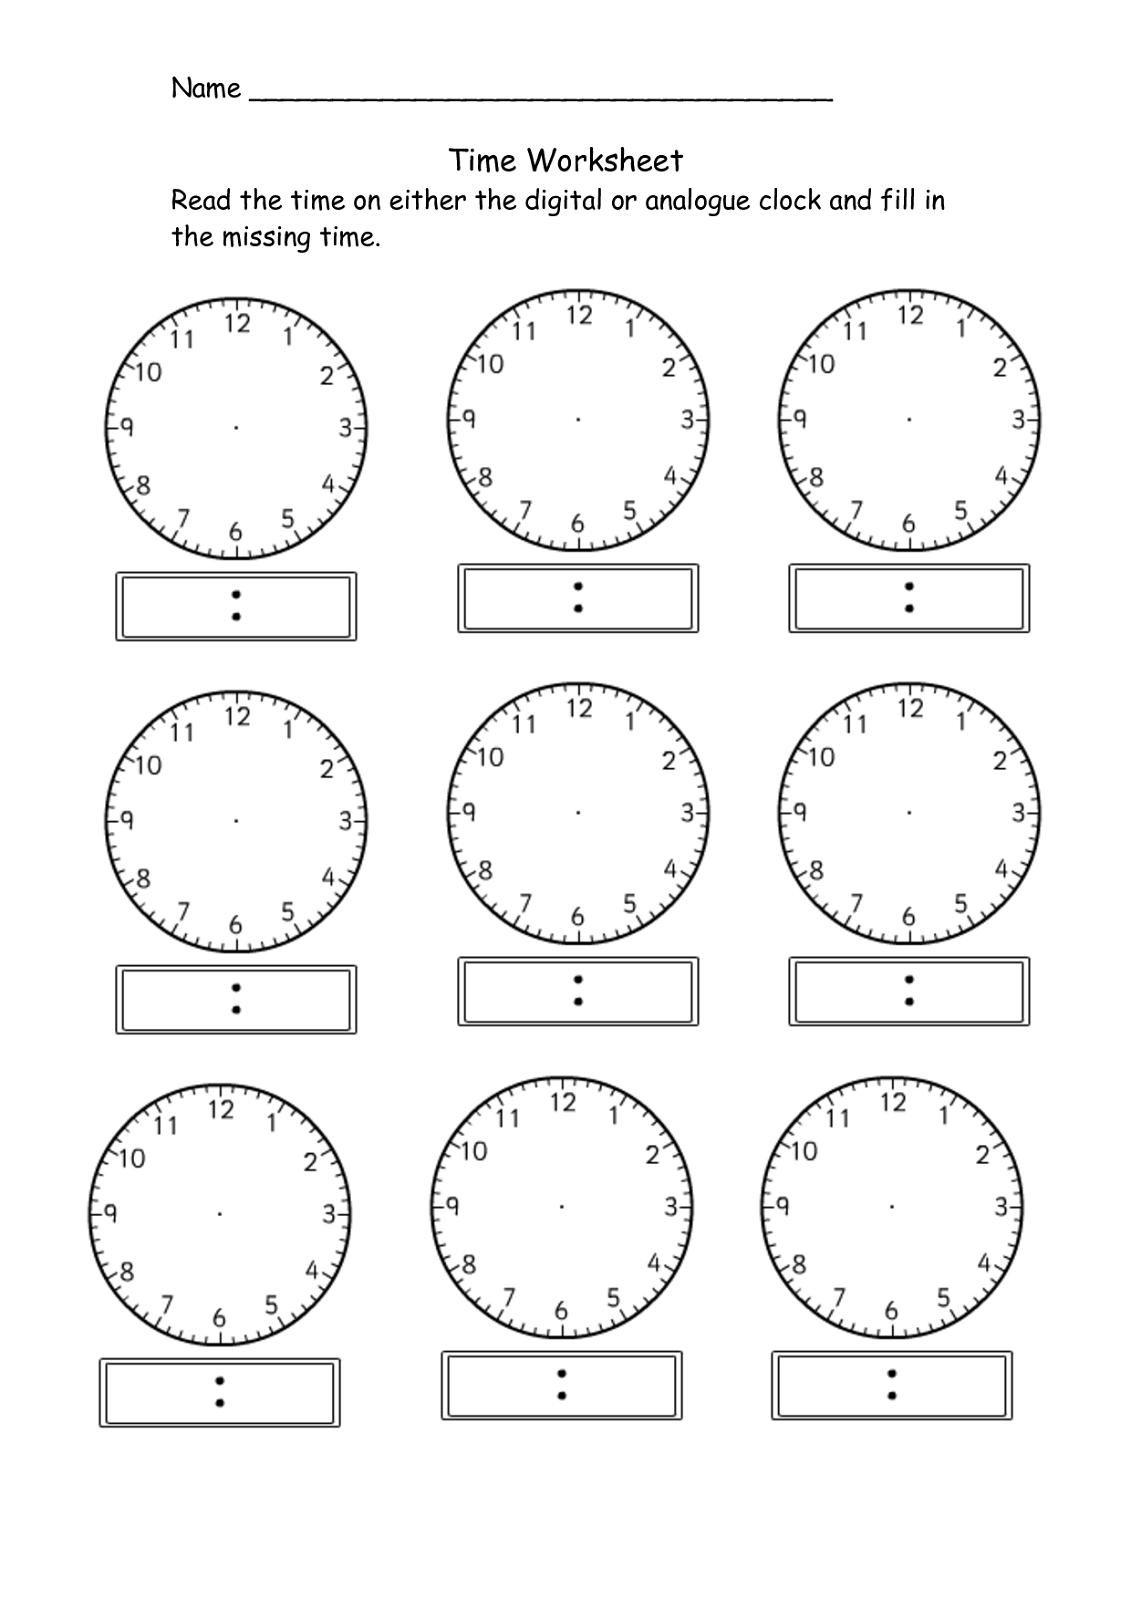 Workbooks home ec worksheets : Time Elapsed Worksheets to Print | Activity Shelter | Kids ...